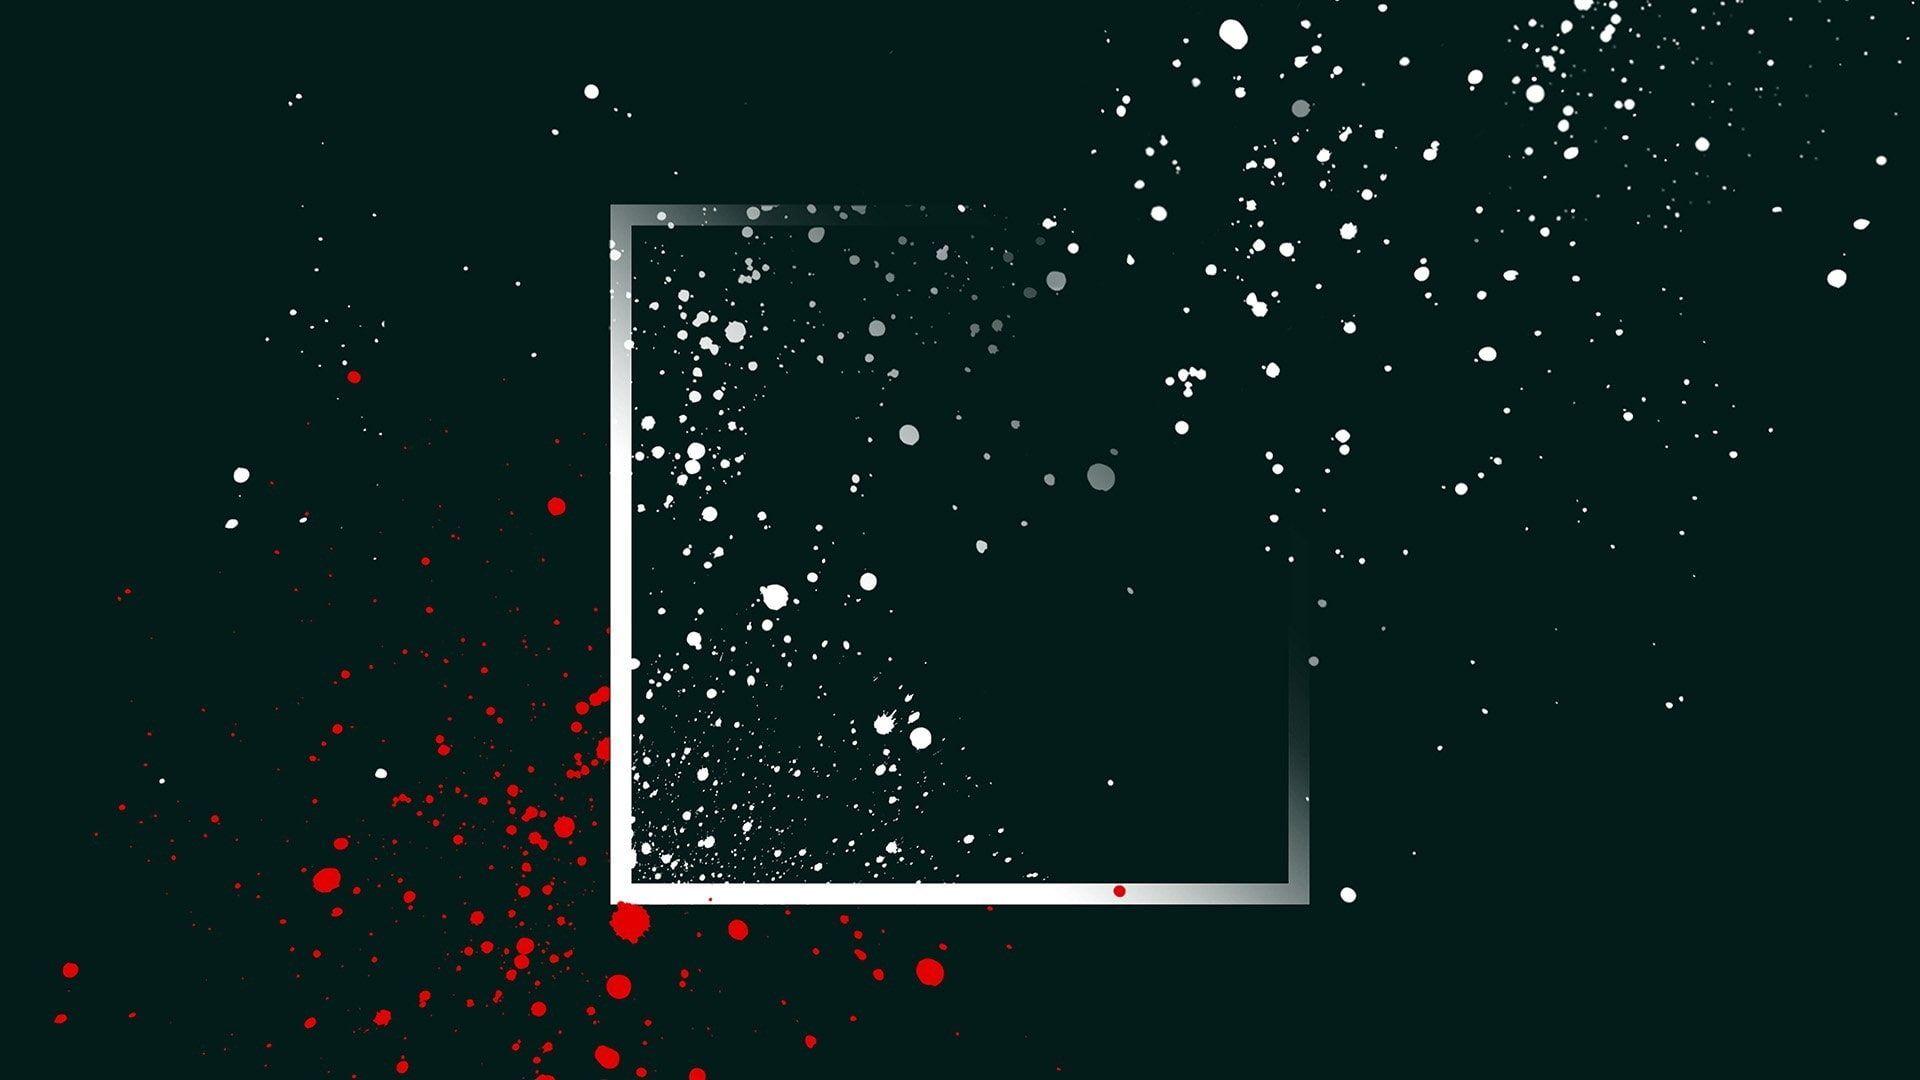 Minimalism Background Desktop 1080p Wallpaper Hdwallpaper Desktop In 2020 Red Artwork Abstract Red Artwork Abstract